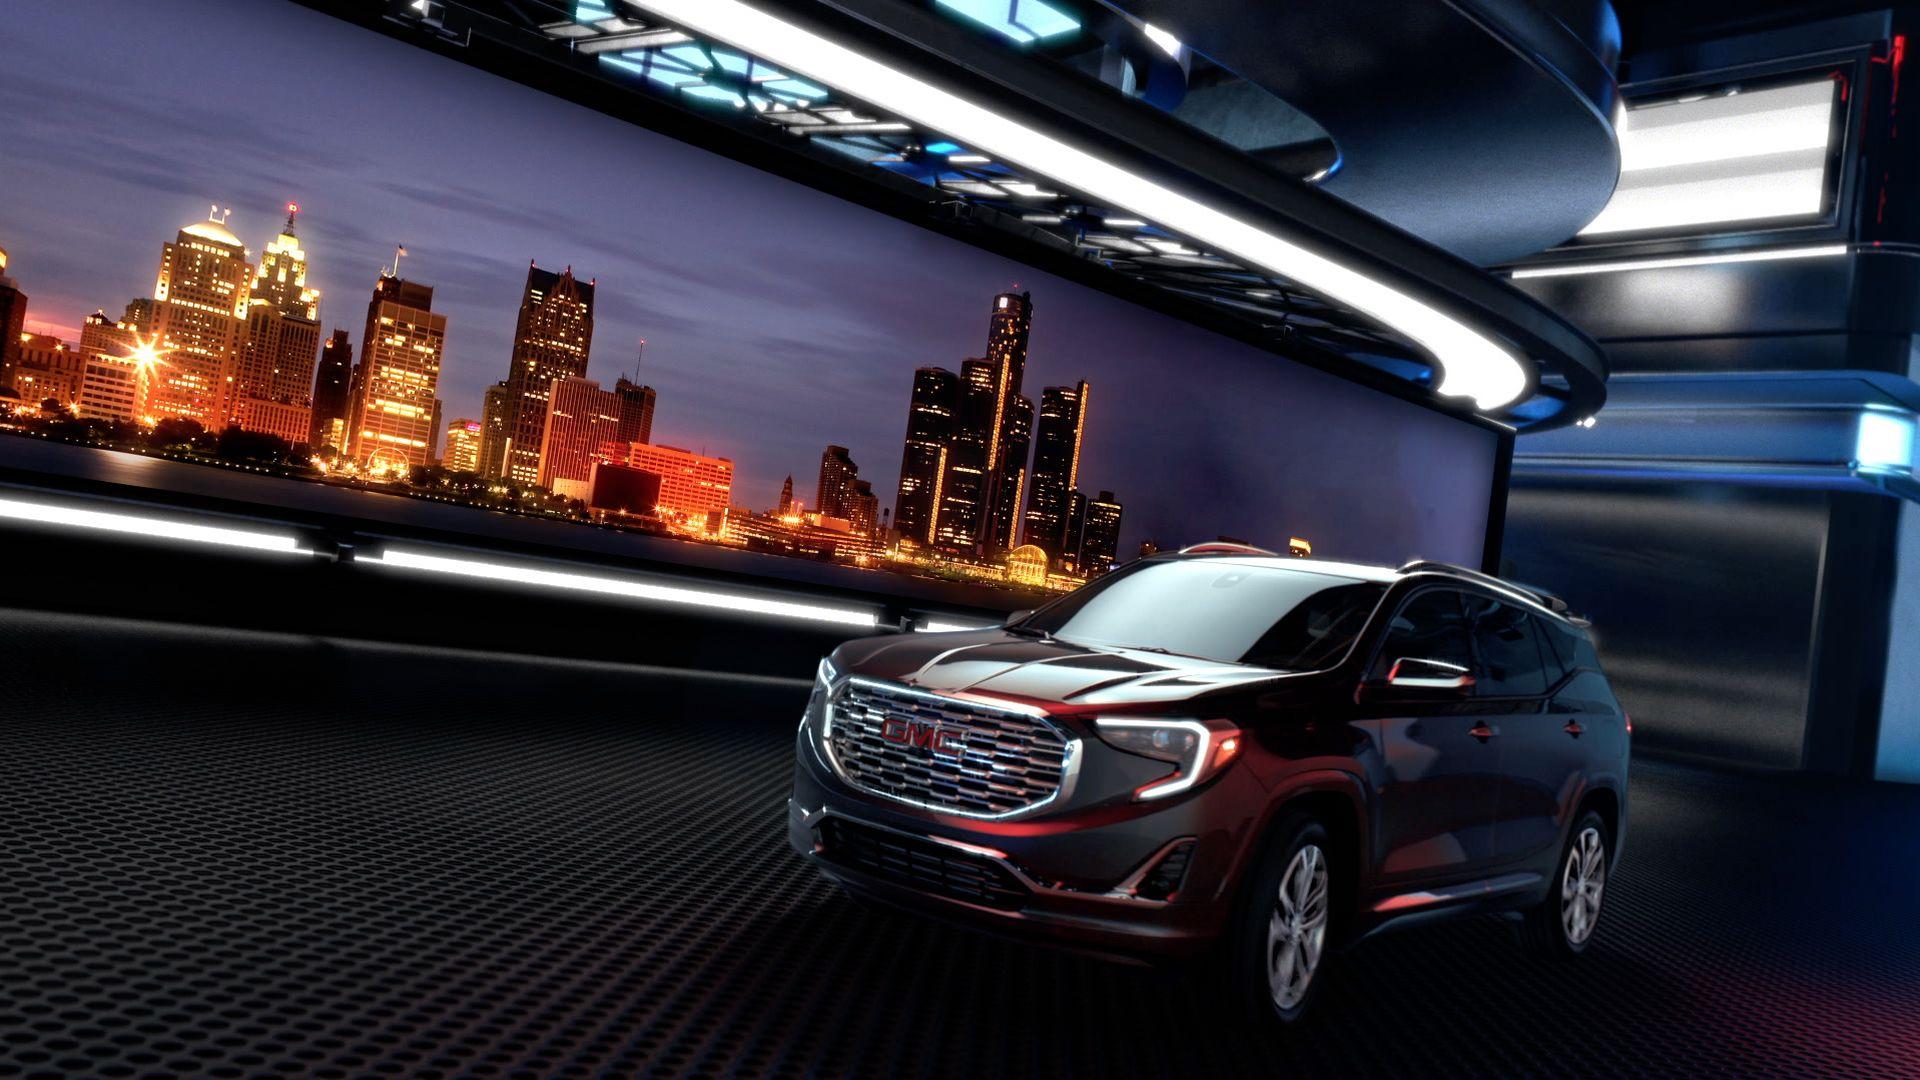 Detroit Futuristic Garage 1080